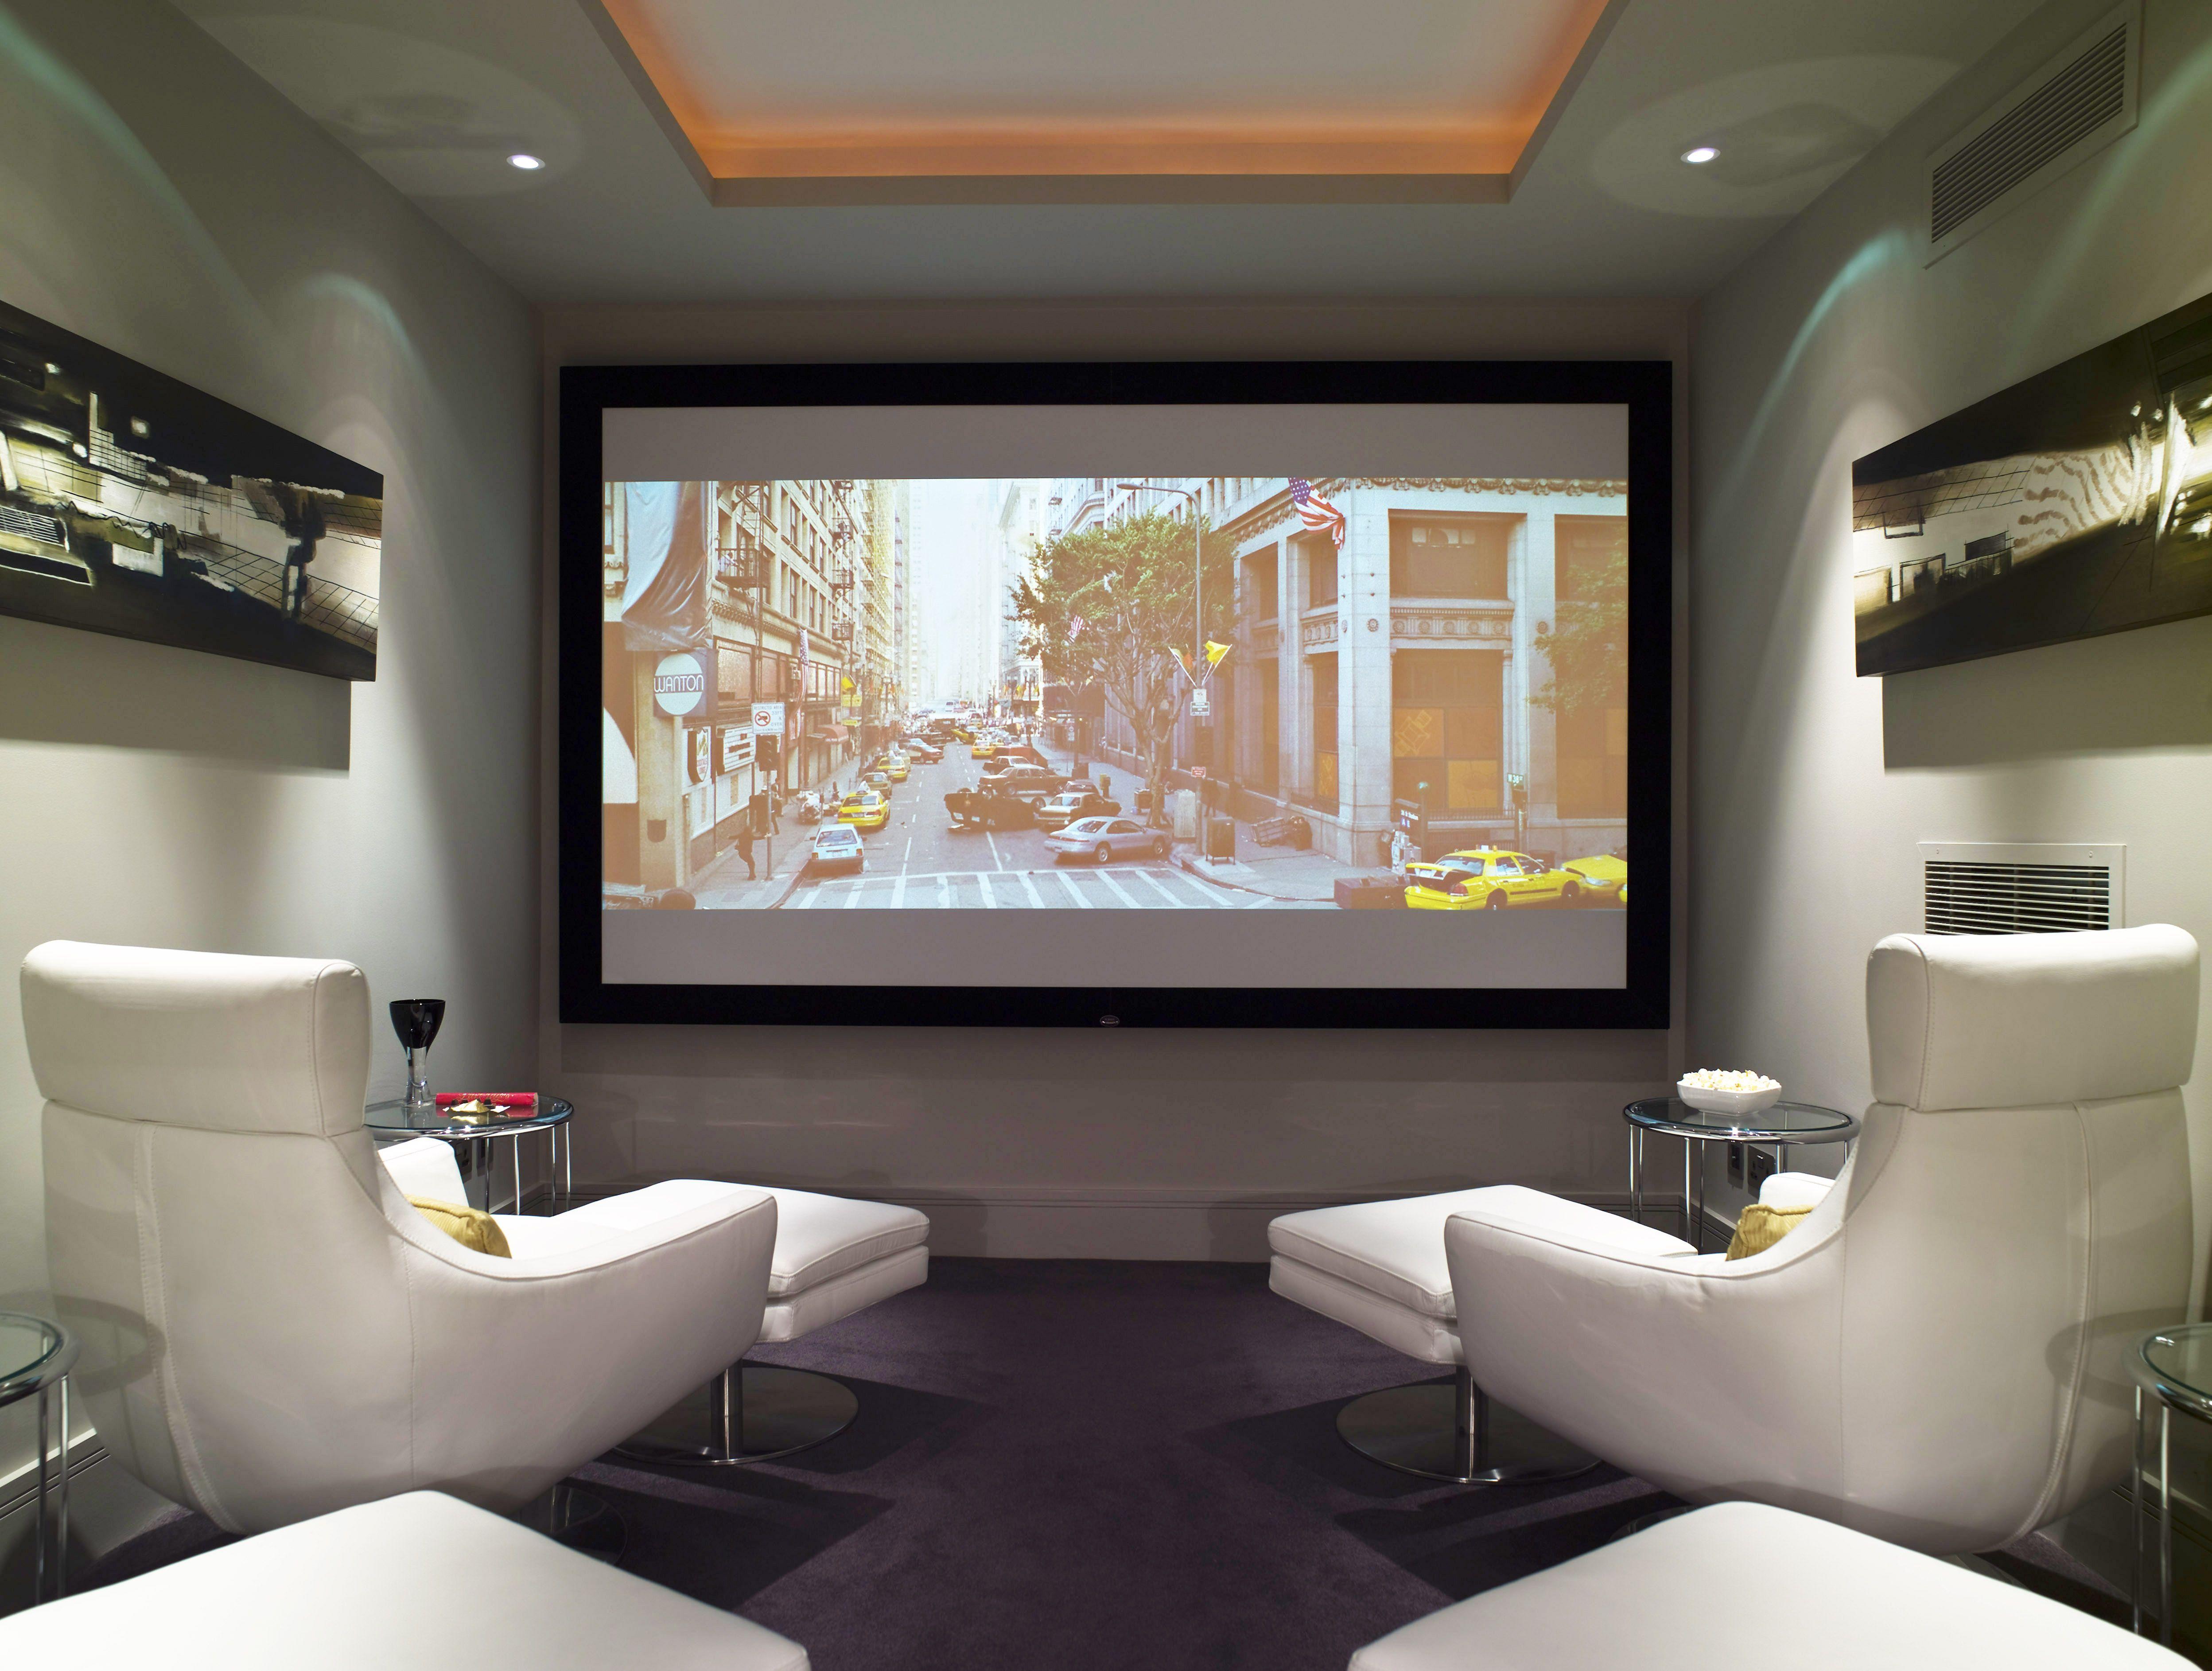 cinema room furniture. Designer Furniture And Home Accessories - Distinctify Furniture. Cinema RoomSofa Room